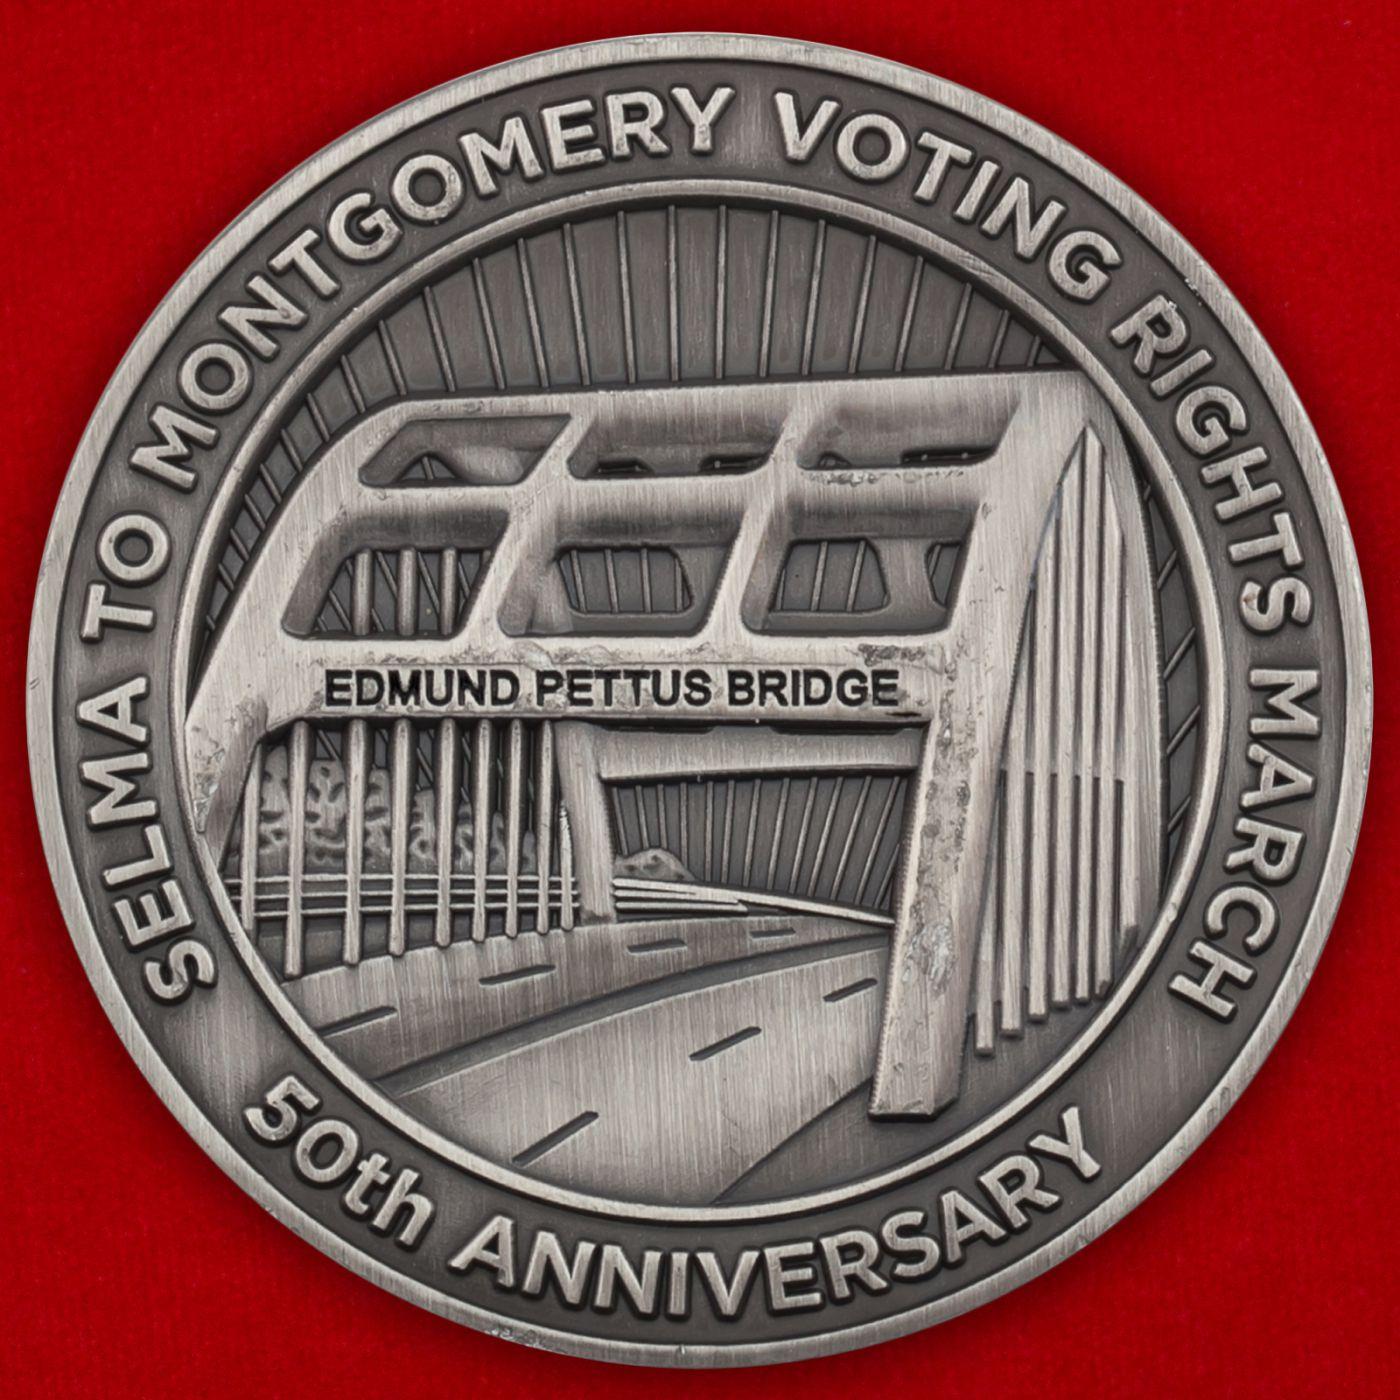 Челлендж коин к 50-летию моста Edmund Pettus Bridge в Сельме (Алабама)